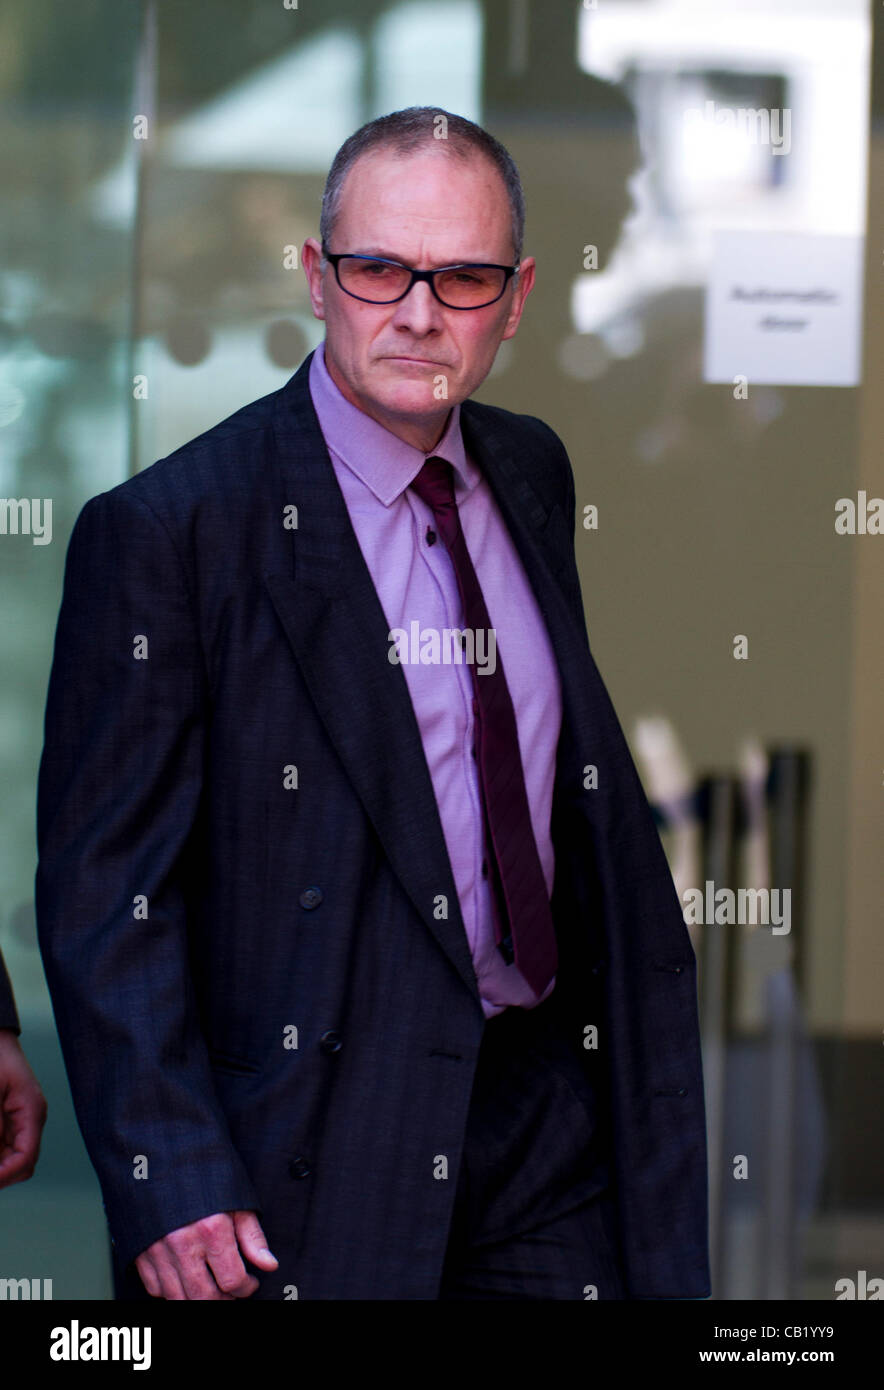 London, UK. 22nd May 2012. PC Alex MacFarlane leaves Westminster Magistrates Court, London. PC Alex MacFarlane allegedly - Stock Image